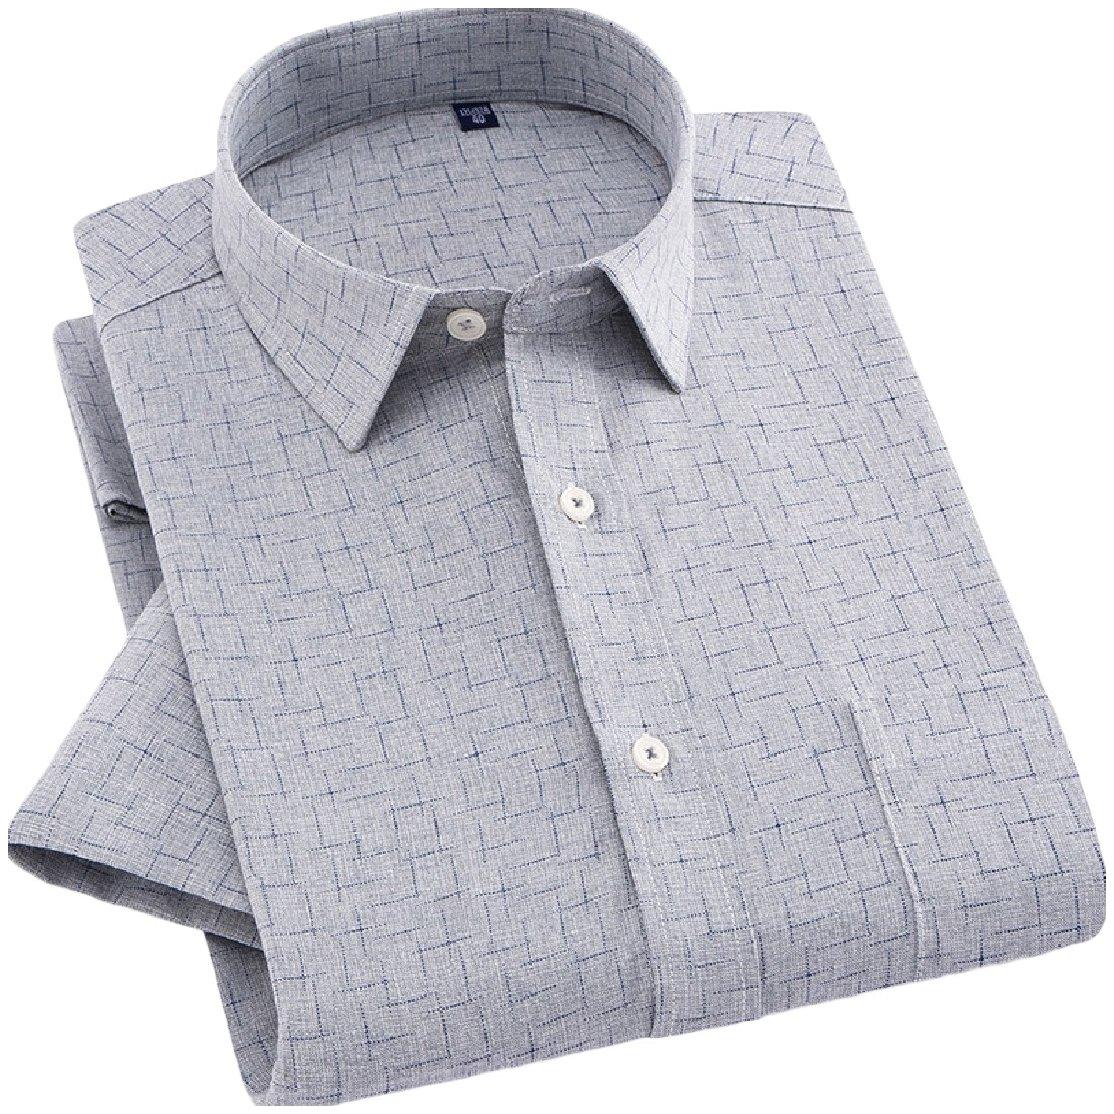 YUNY Mens Business Cardi Short Sleeve Linen Half Sleeve Square Collar Shirt AS18 2XL